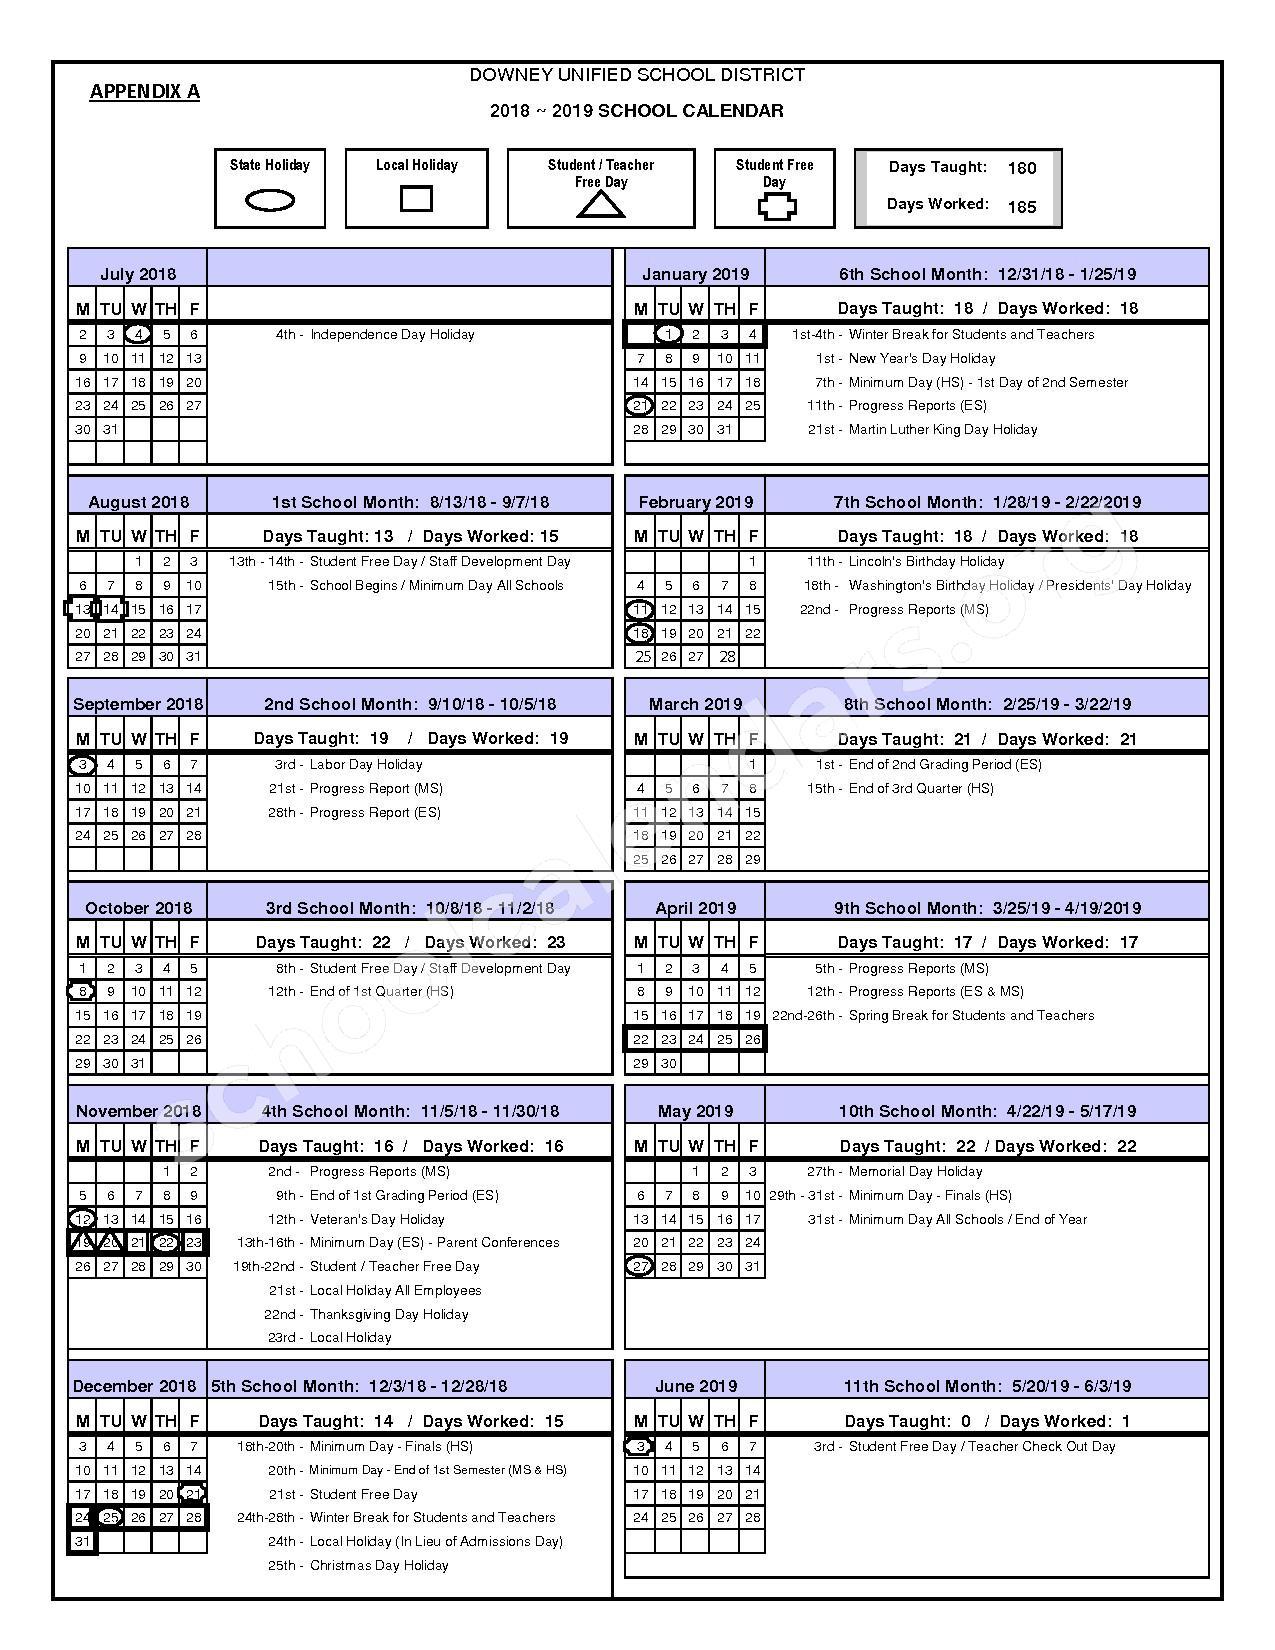 2018 - 2019 DUSD Calendar – Downey Unified School District – page 1